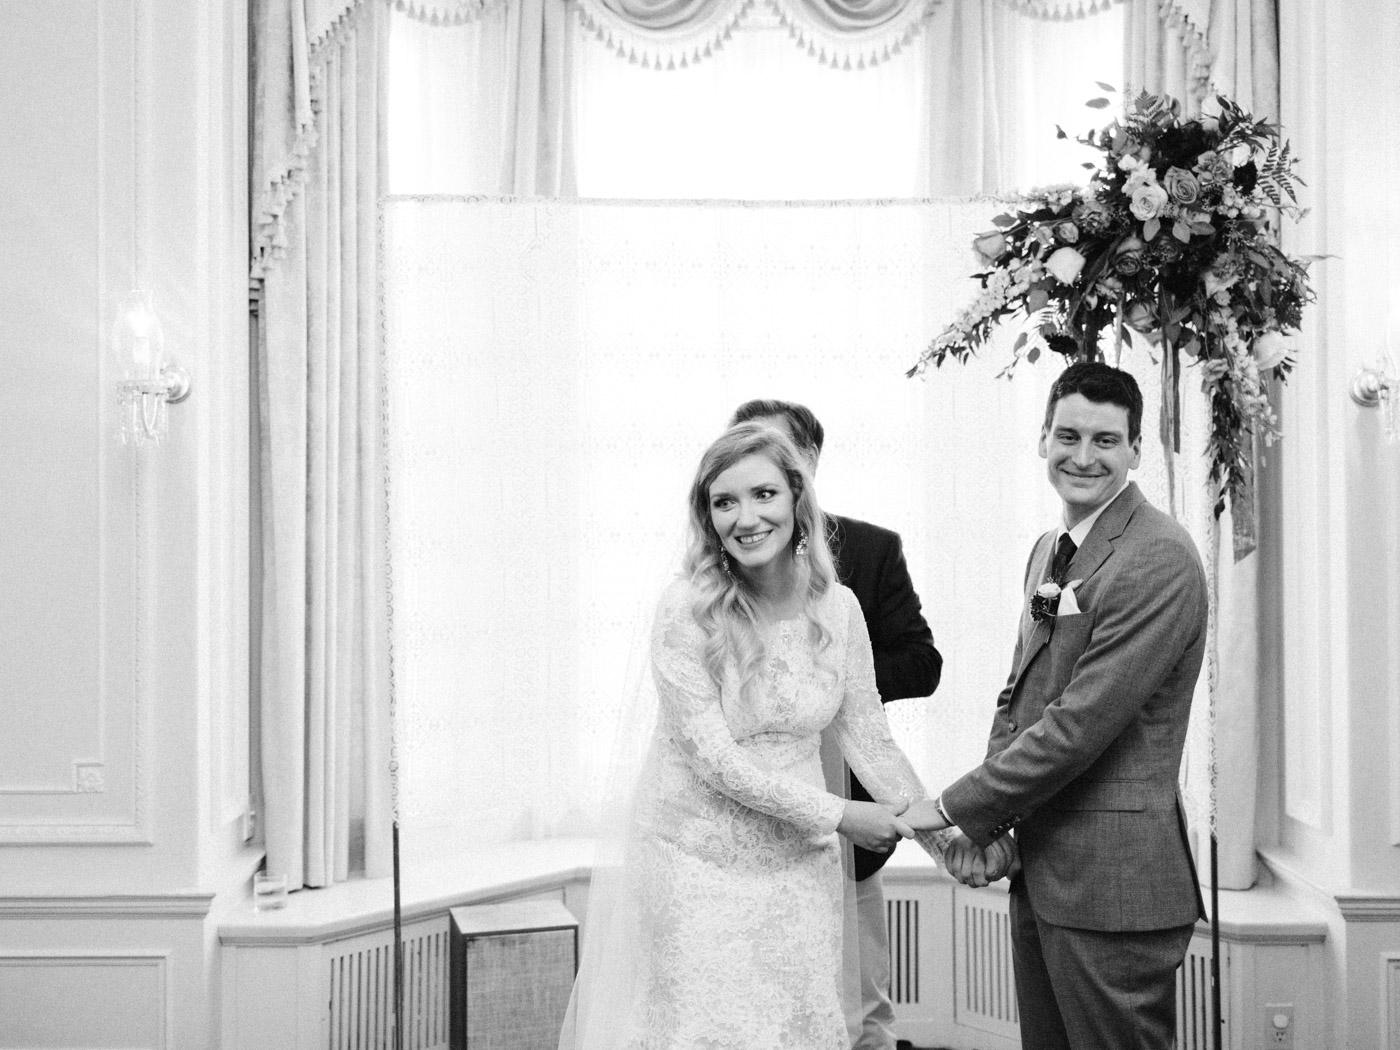 Toronto-wedding-photographer-intimate-classic-fine-art-elopement-ottawa33.jpg